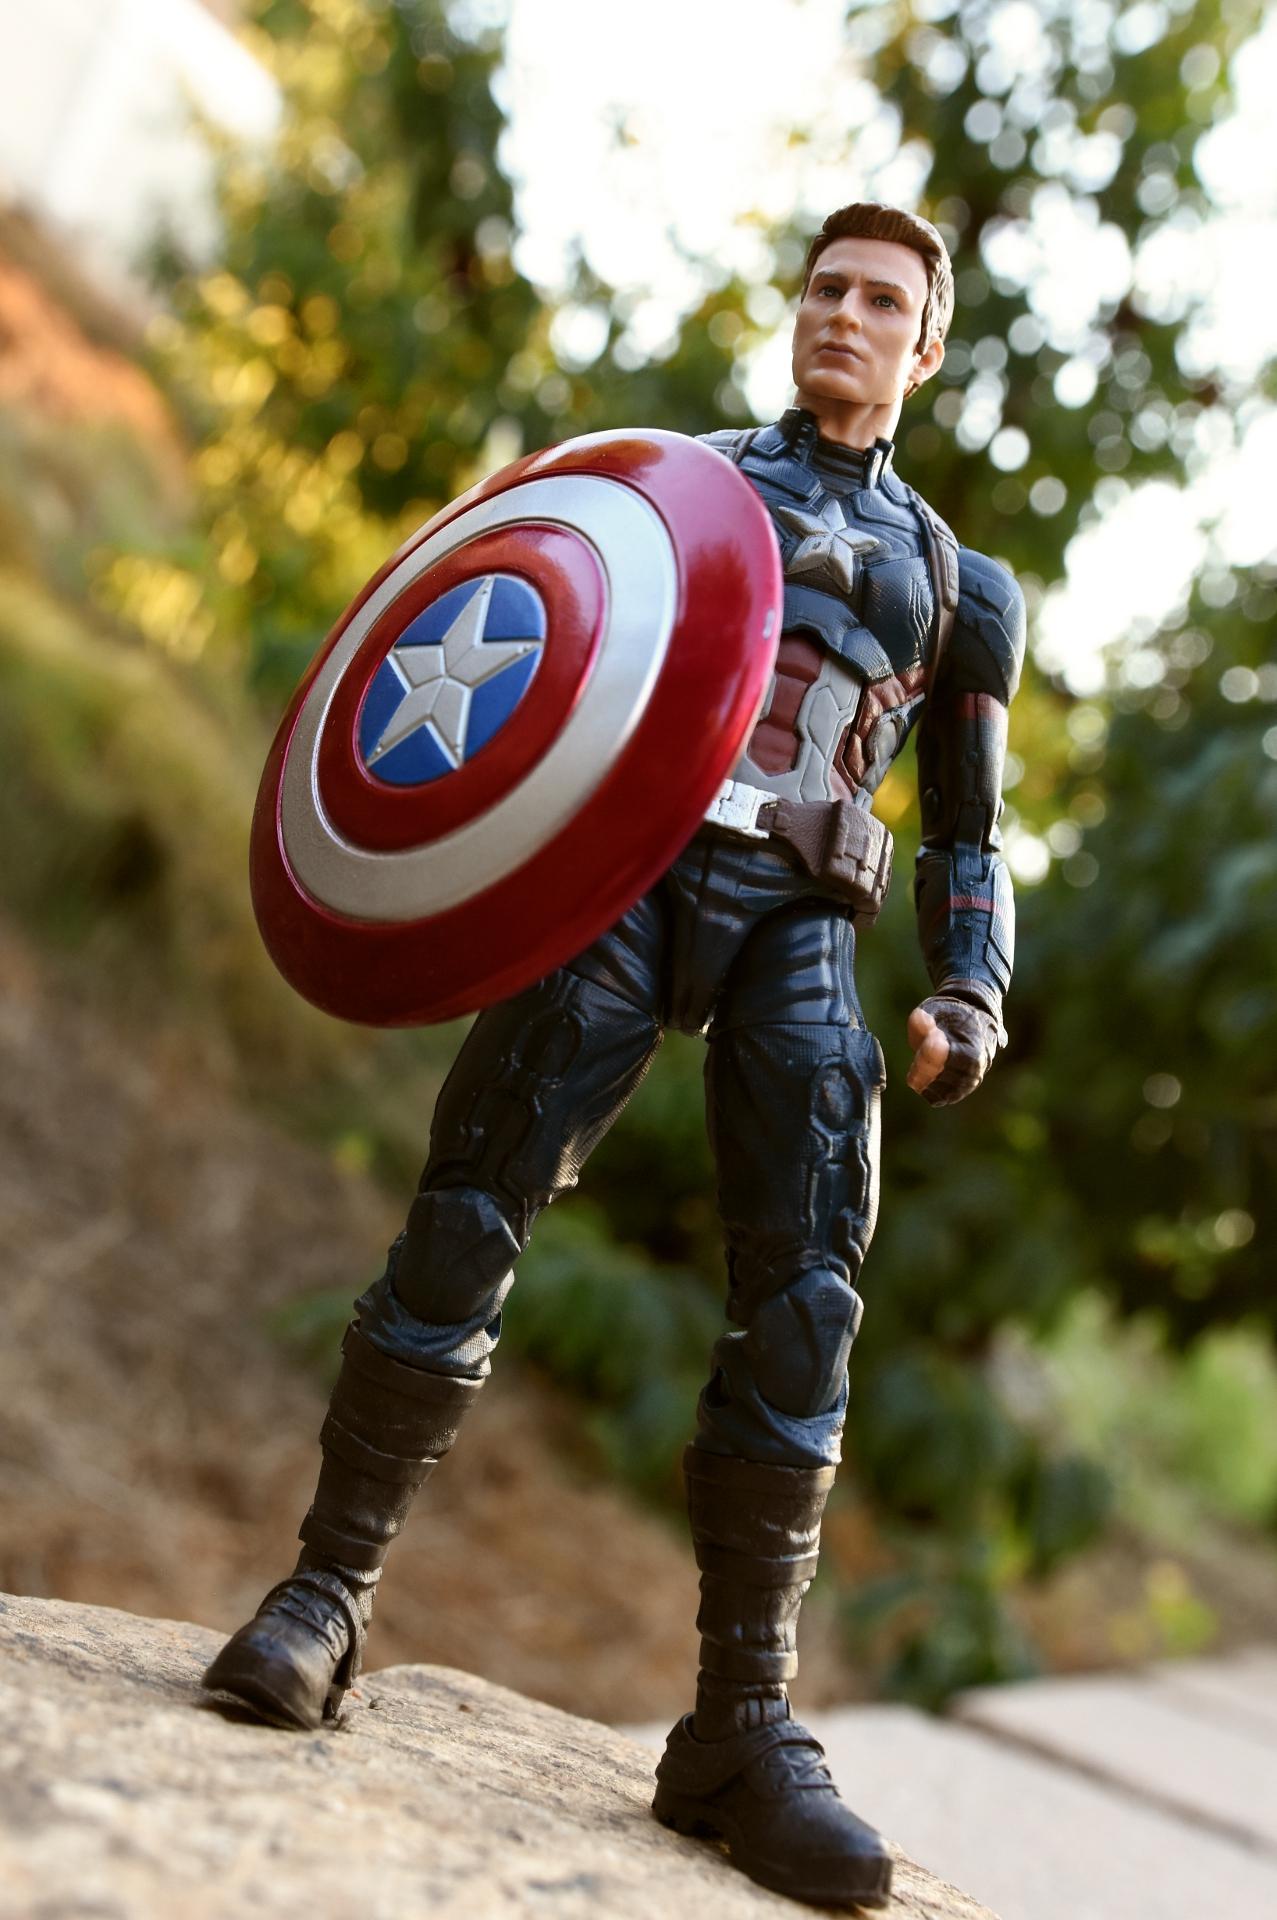 hasbro: marvel legends captain america and crossbones |